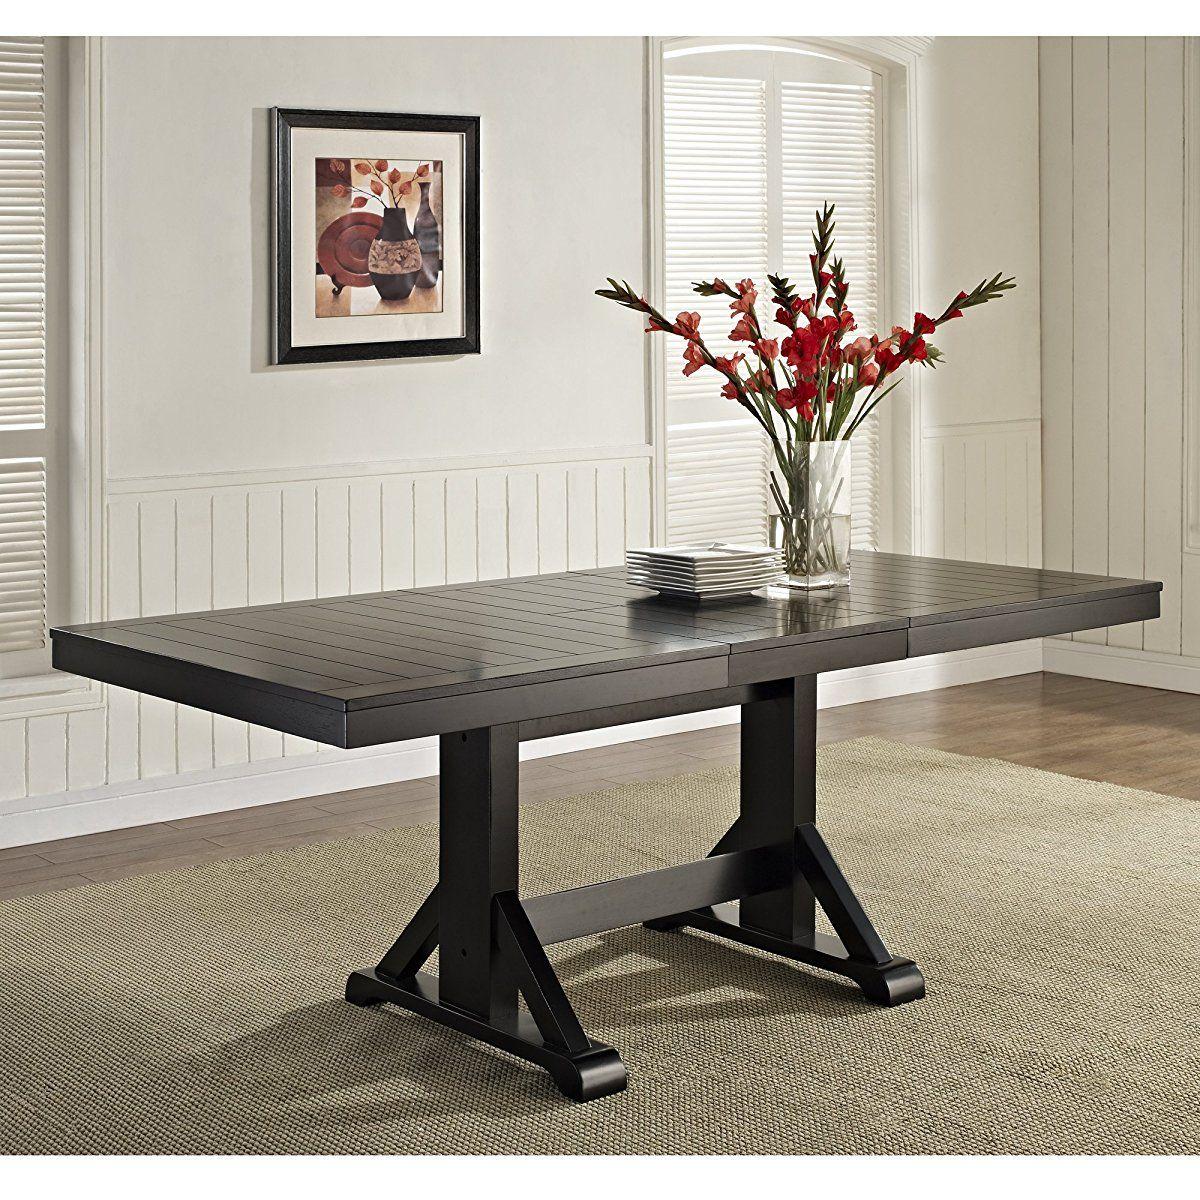 We Furniture 6 Piece Black Solid Wood Dining Set Dining Table Black Dining Table Dining Table In Kitchen